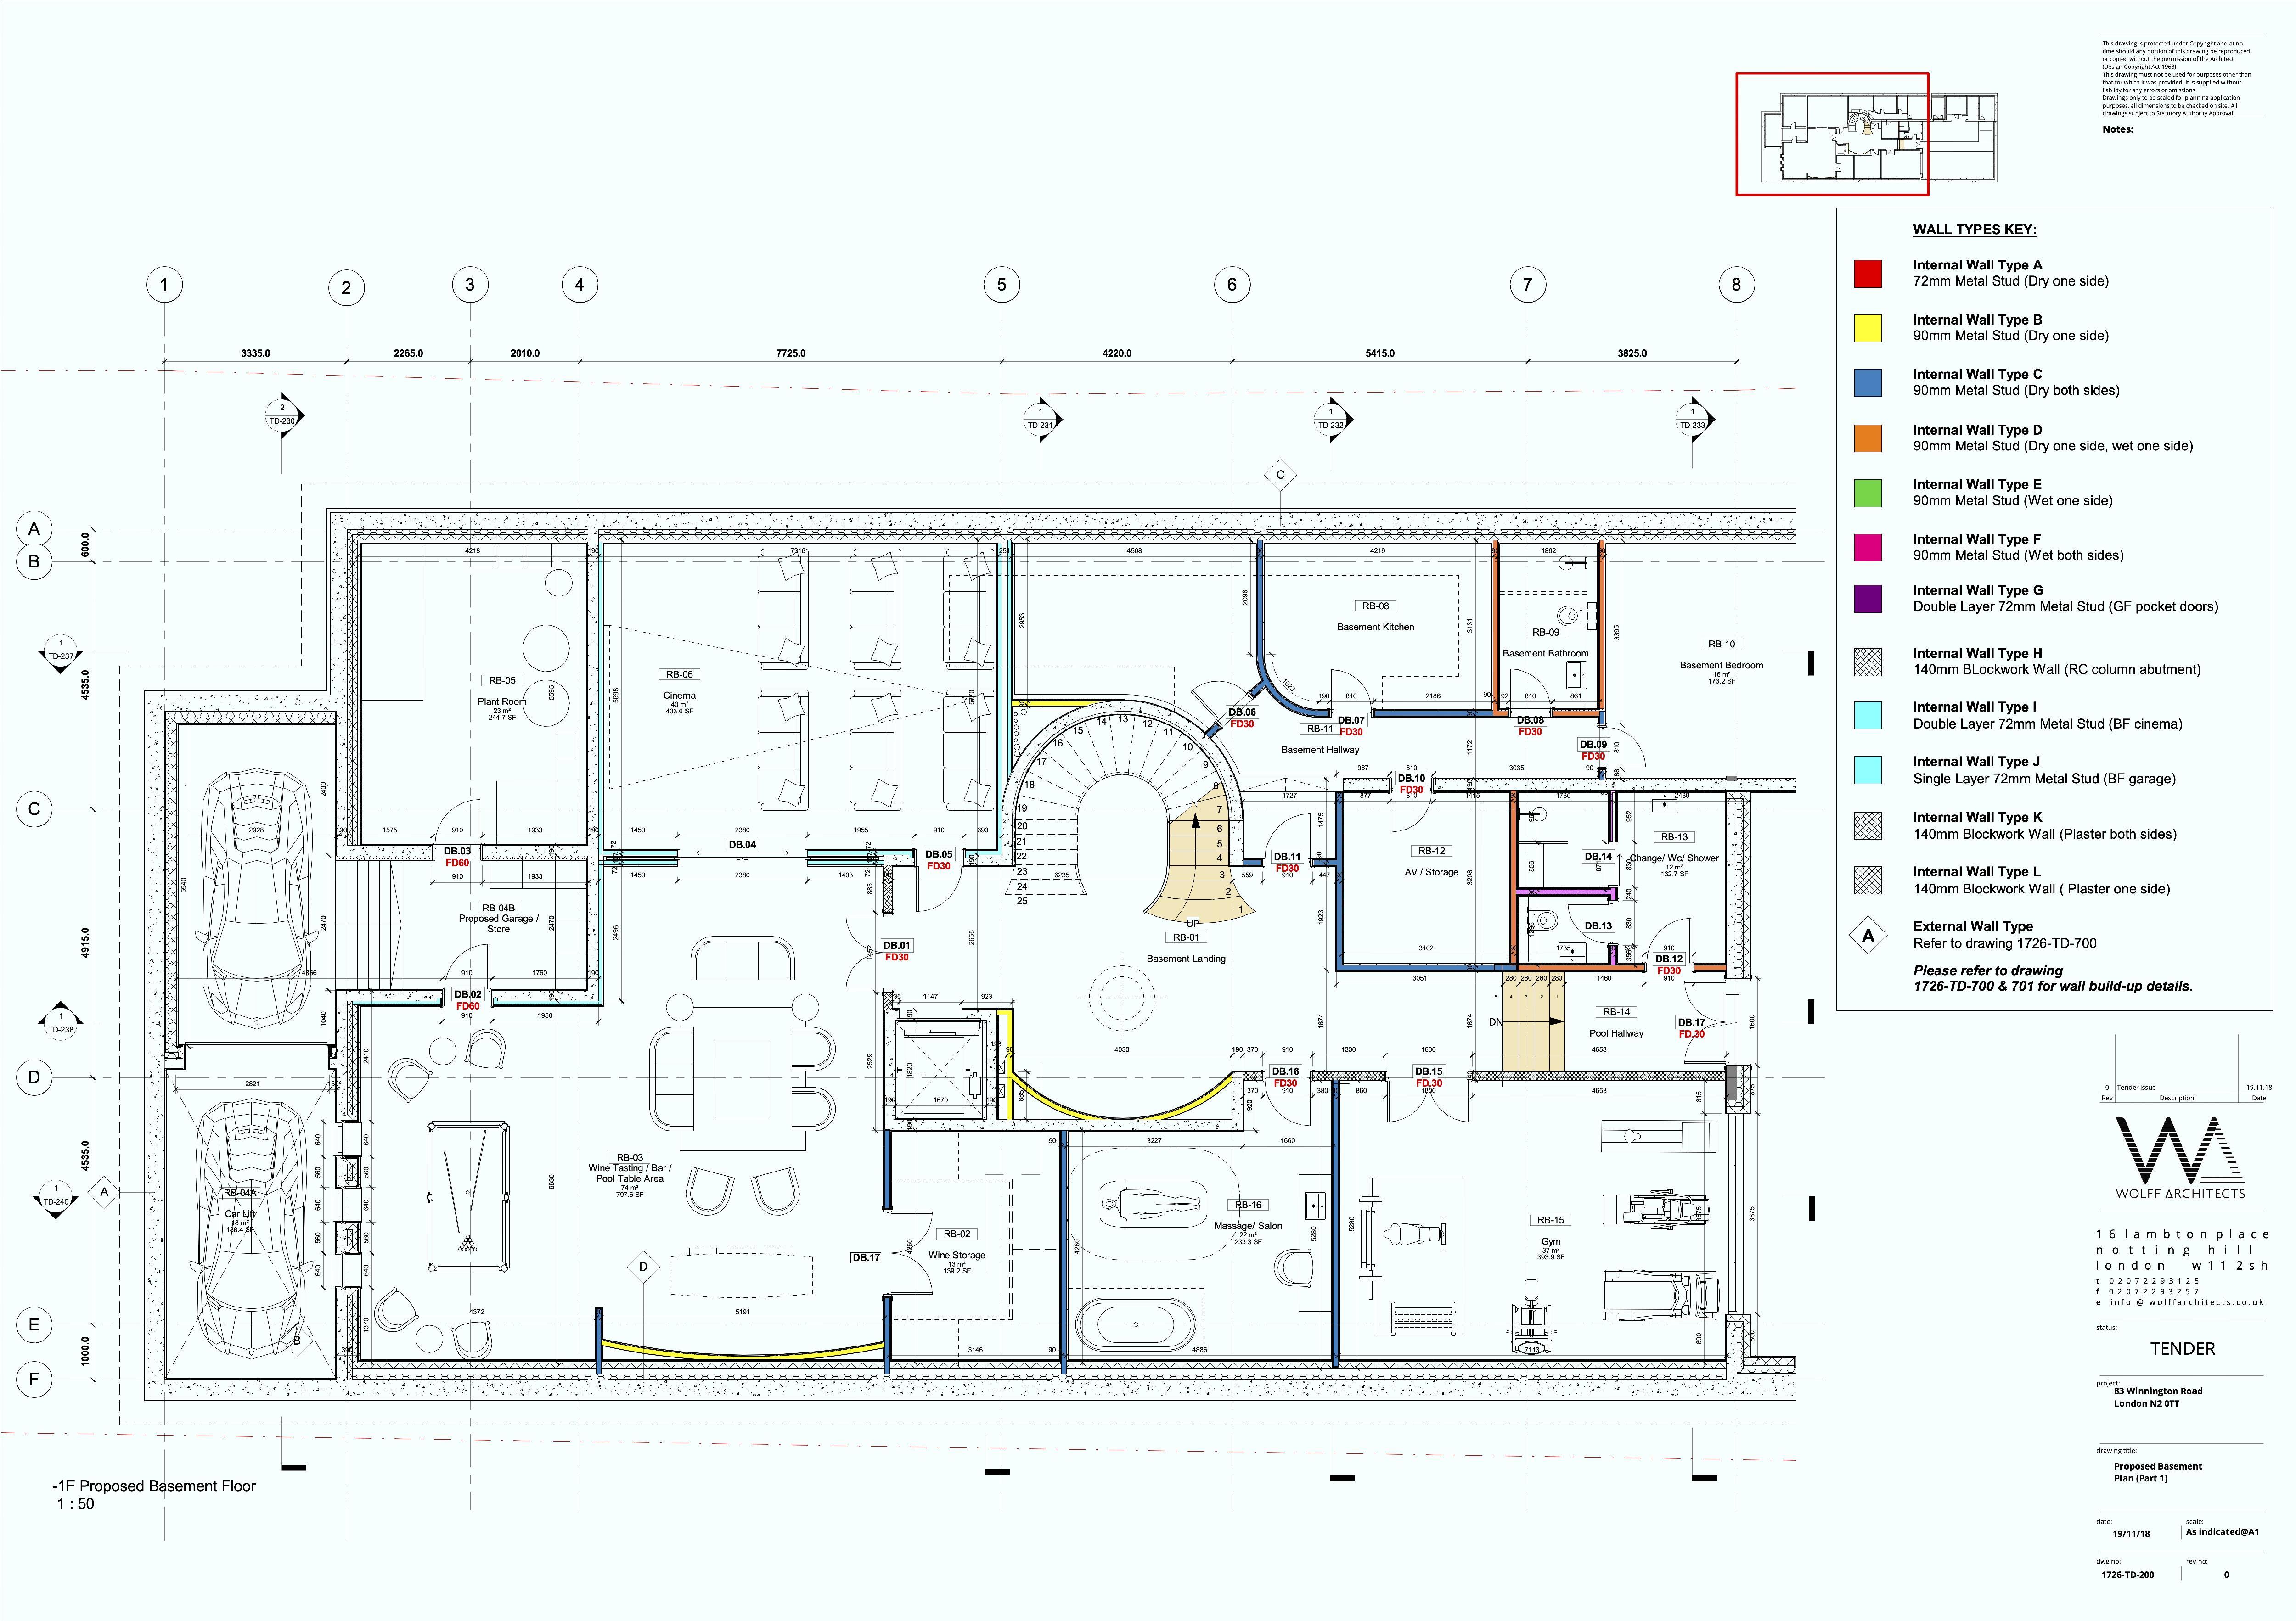 Basement Floor Plans Pt. 1